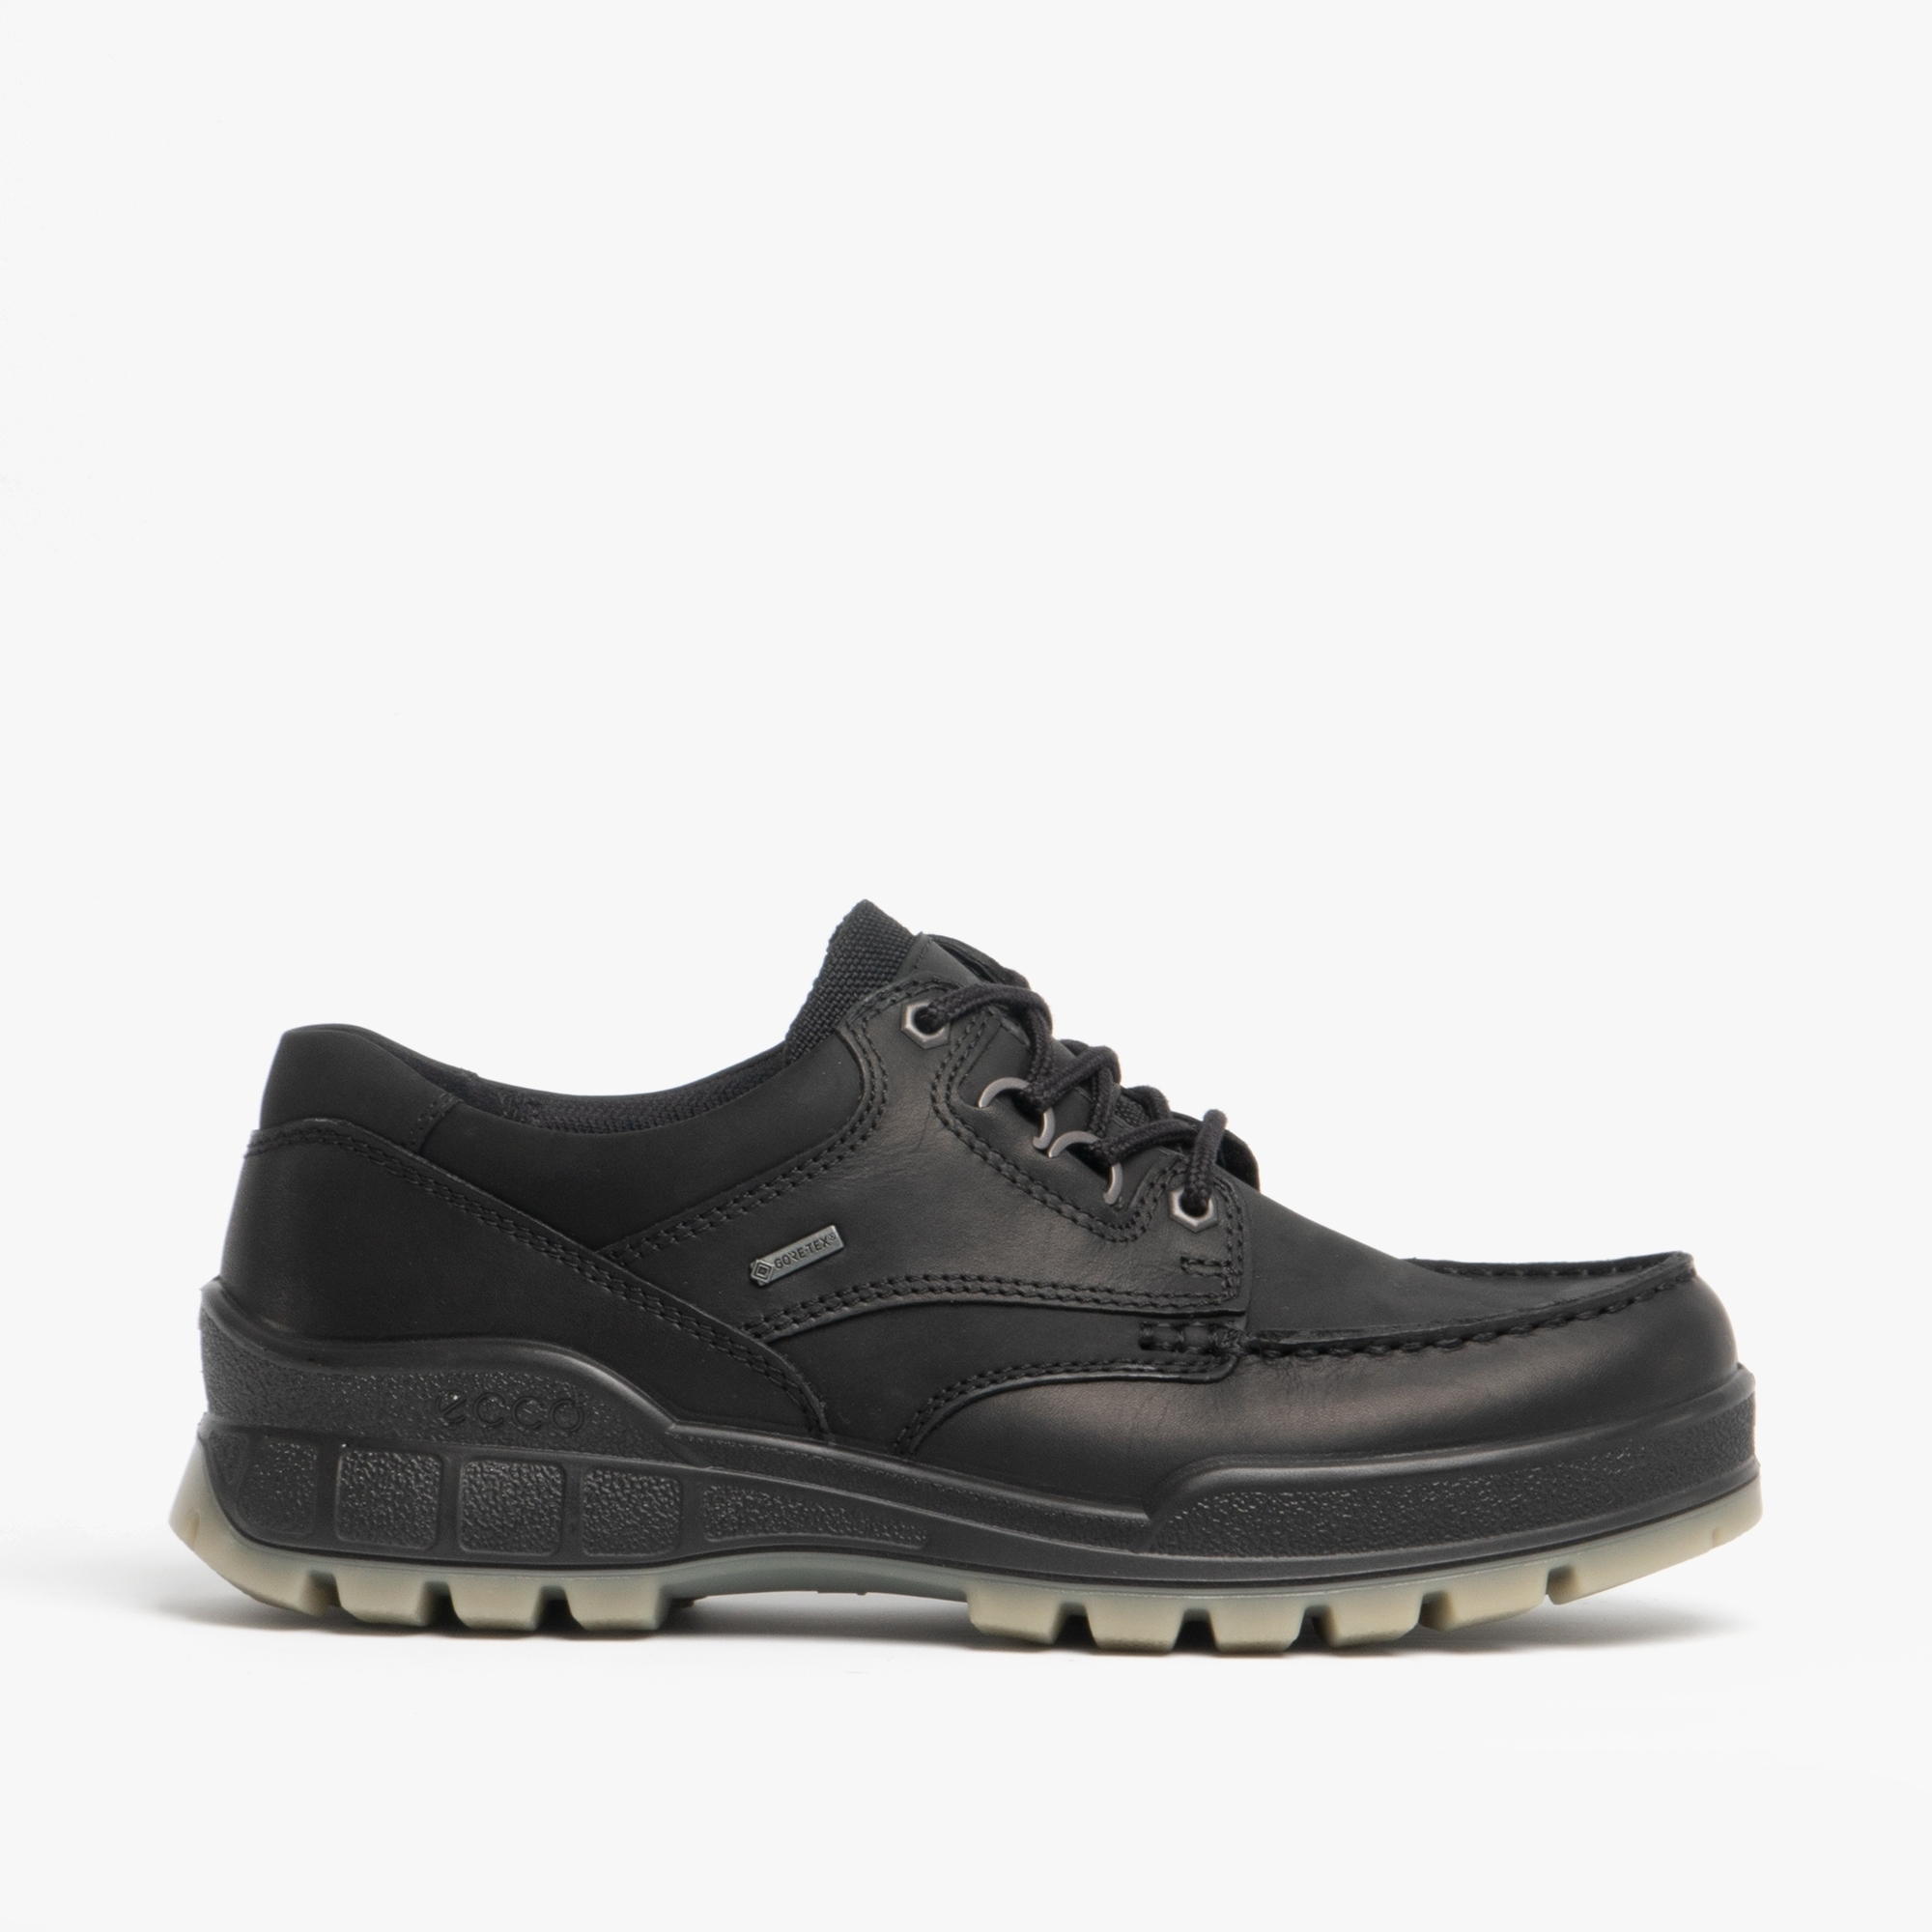 ECCO TRACK 25 Waterproof Walking Shoes